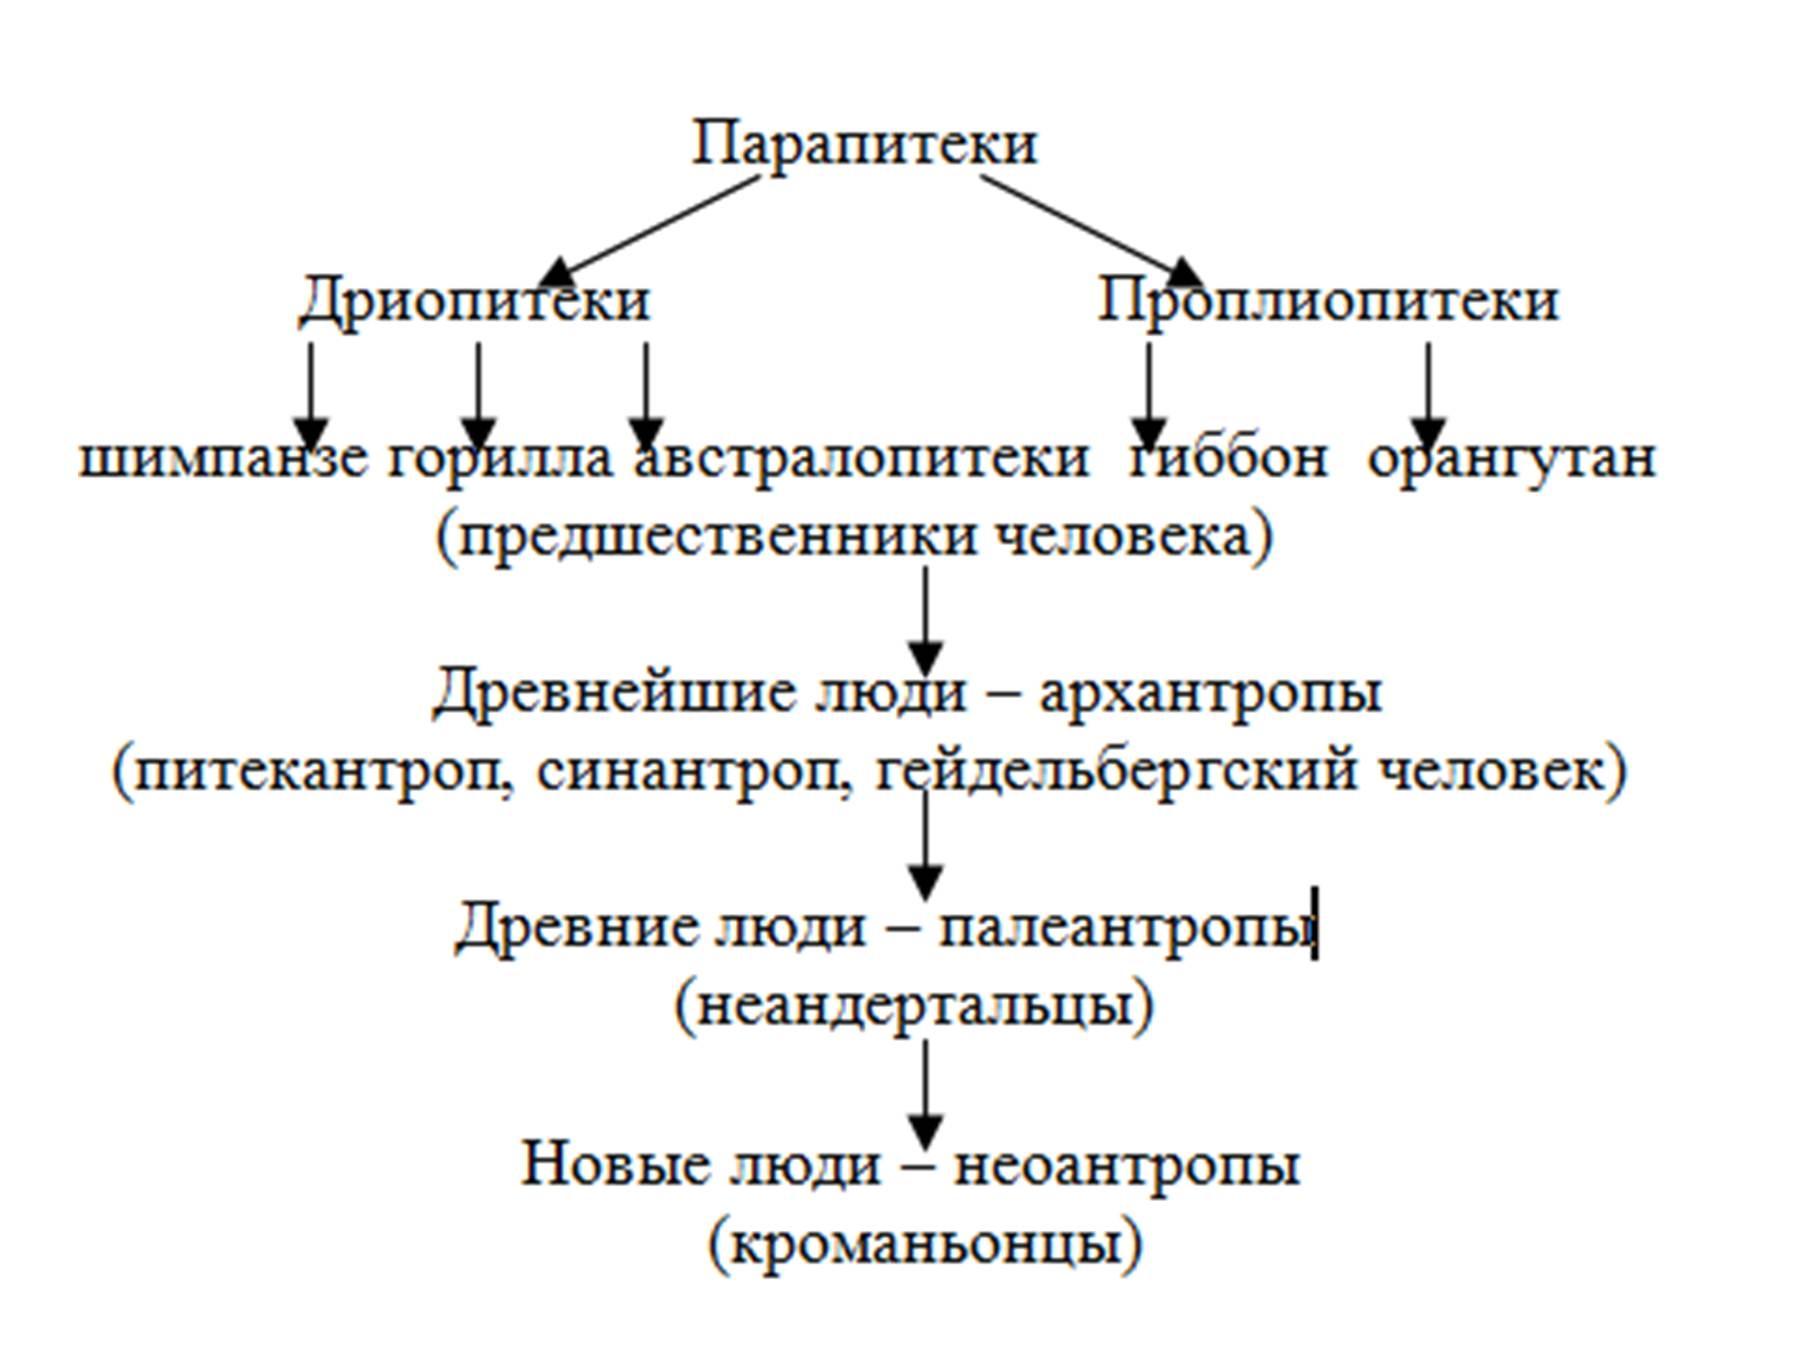 Схема факторов антропогенеза не